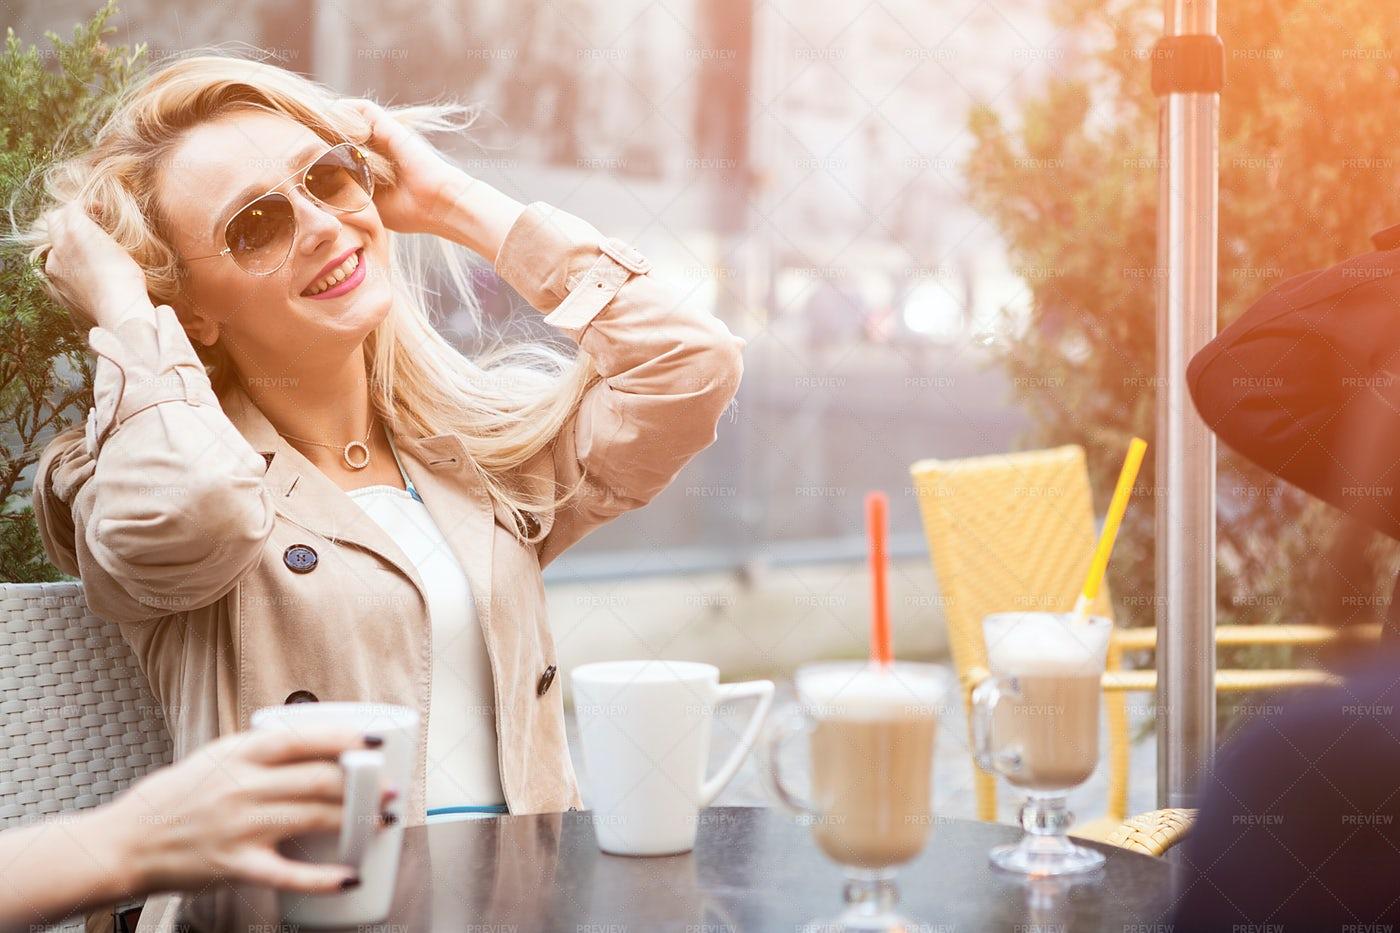 Woman Having Fun With Friends: Stock Photos